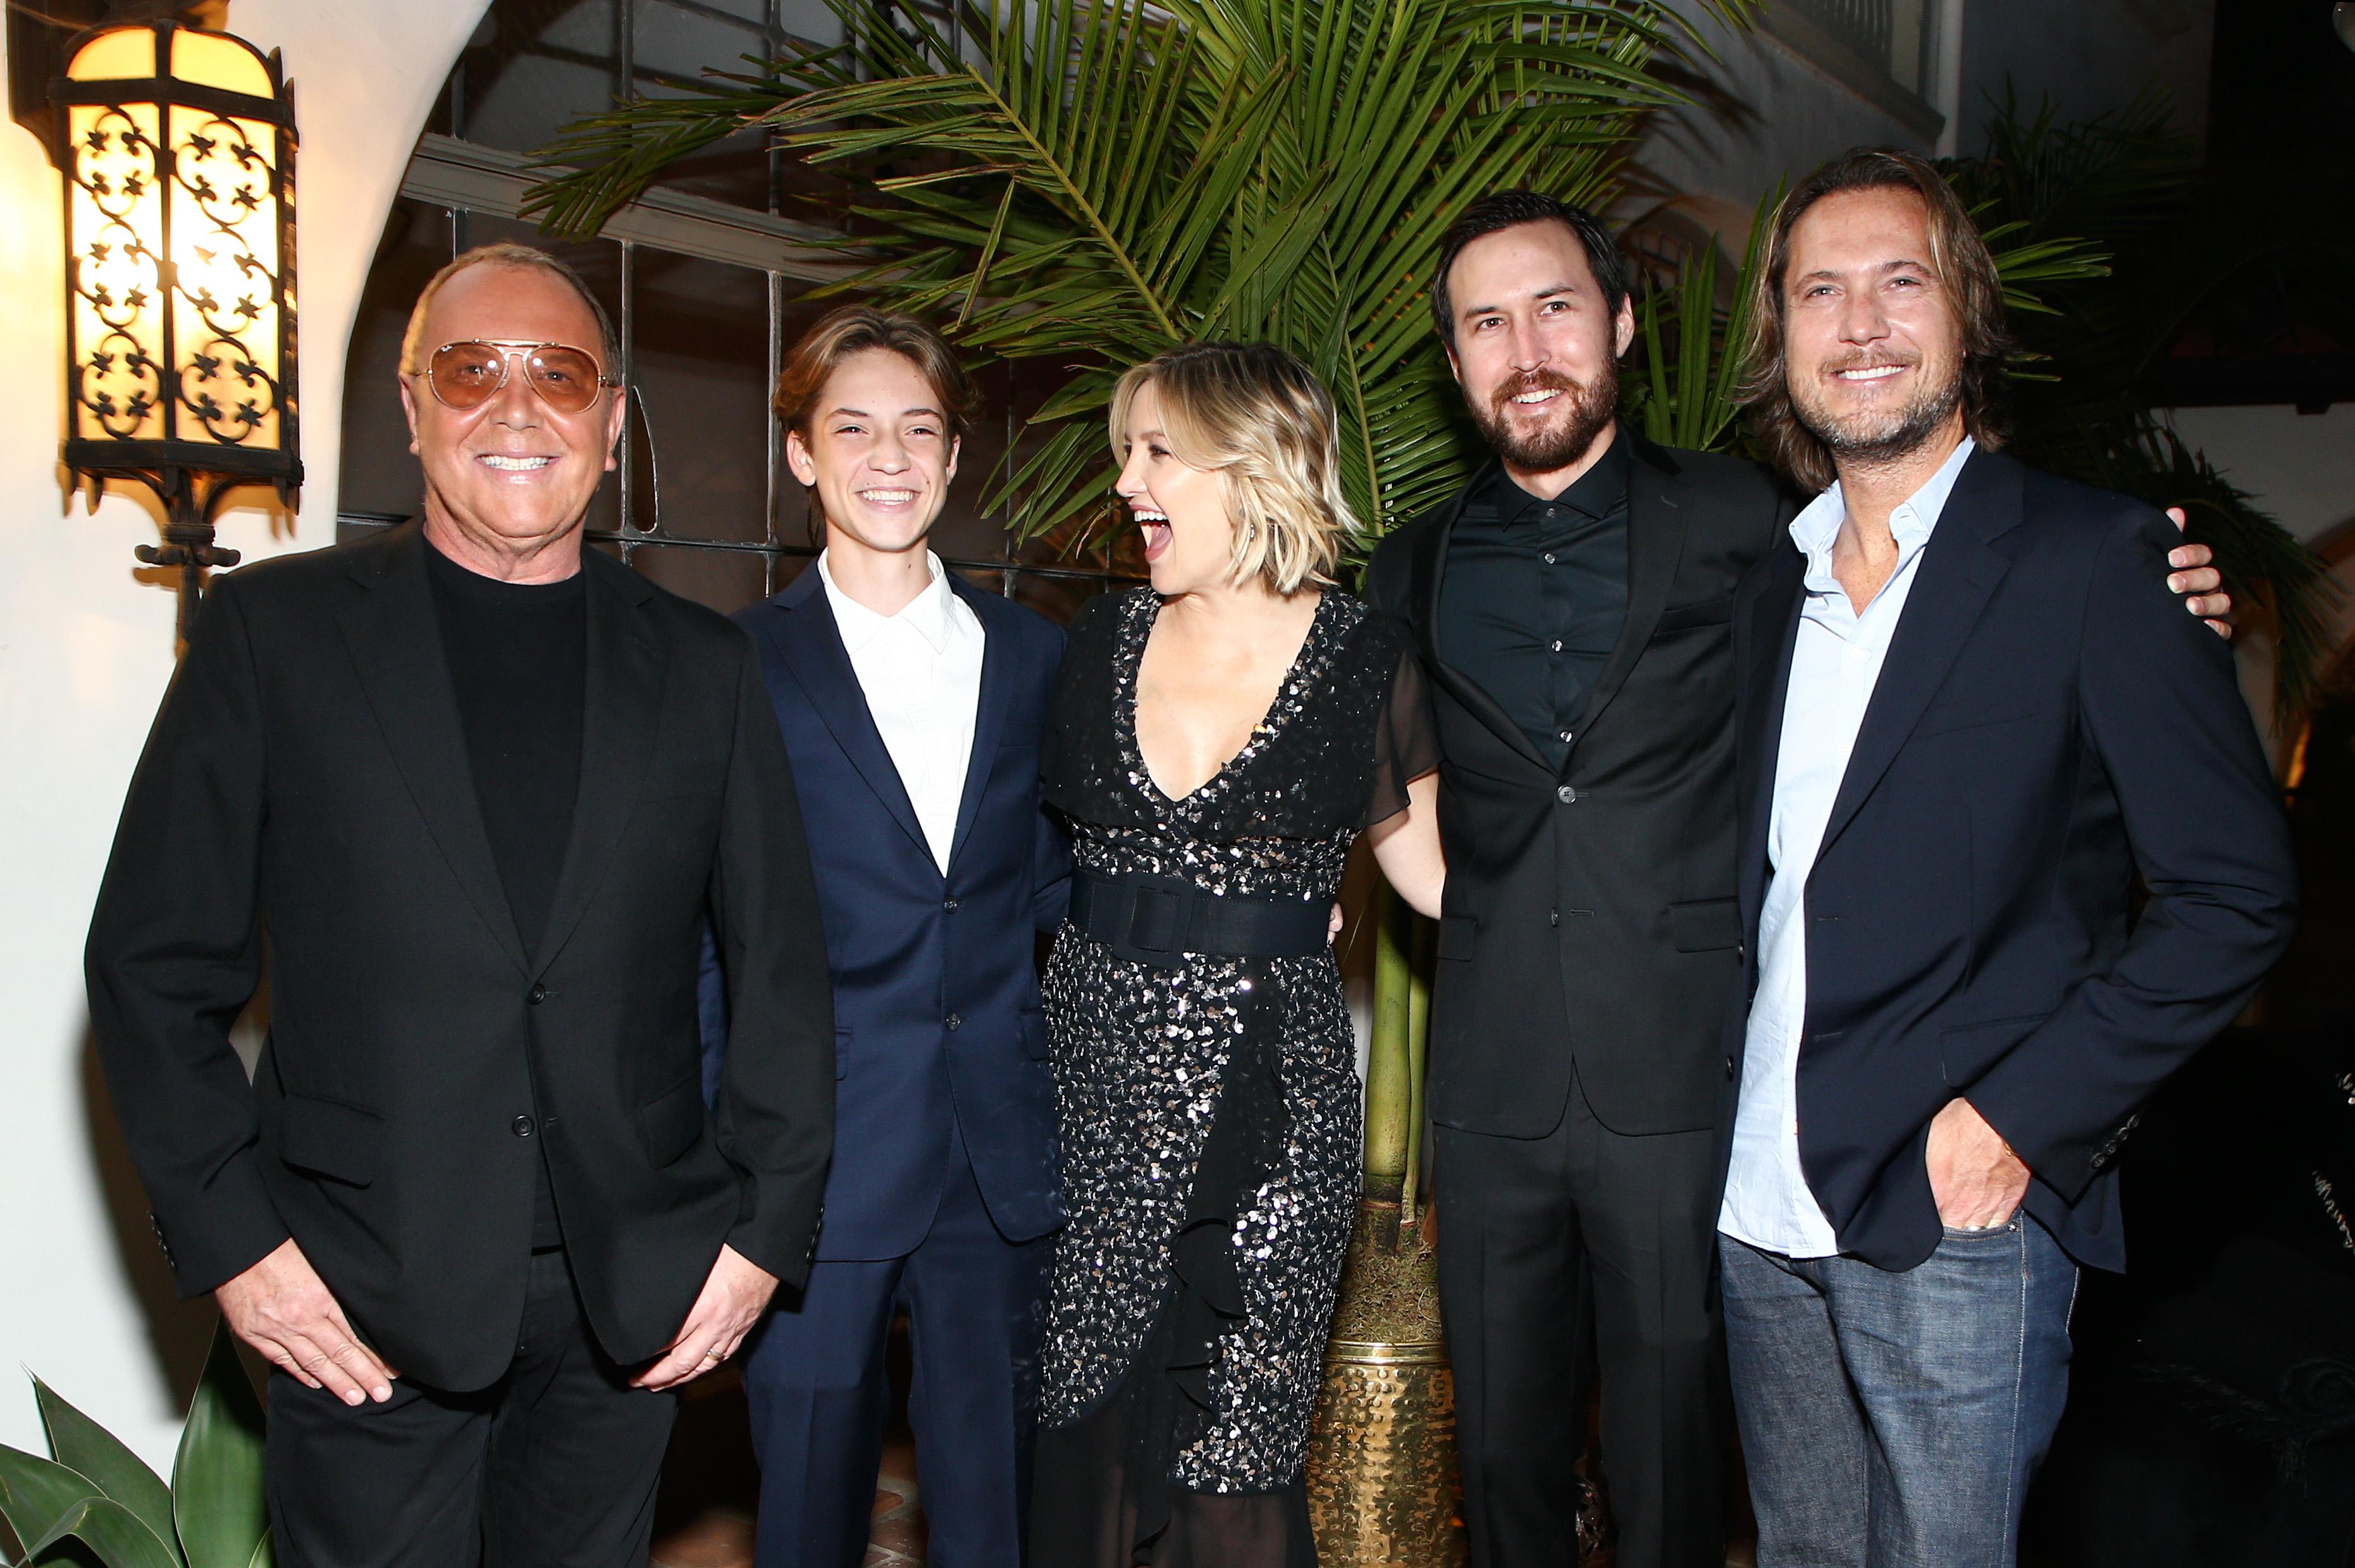 Michael Kors, Ryder Robinson, Kate Hudson, Danny Fujikawa and Lance La PeareMichael Kors x Kate Hudson dinner, Inside, Los Angeles, USA - 07 Nov 2018